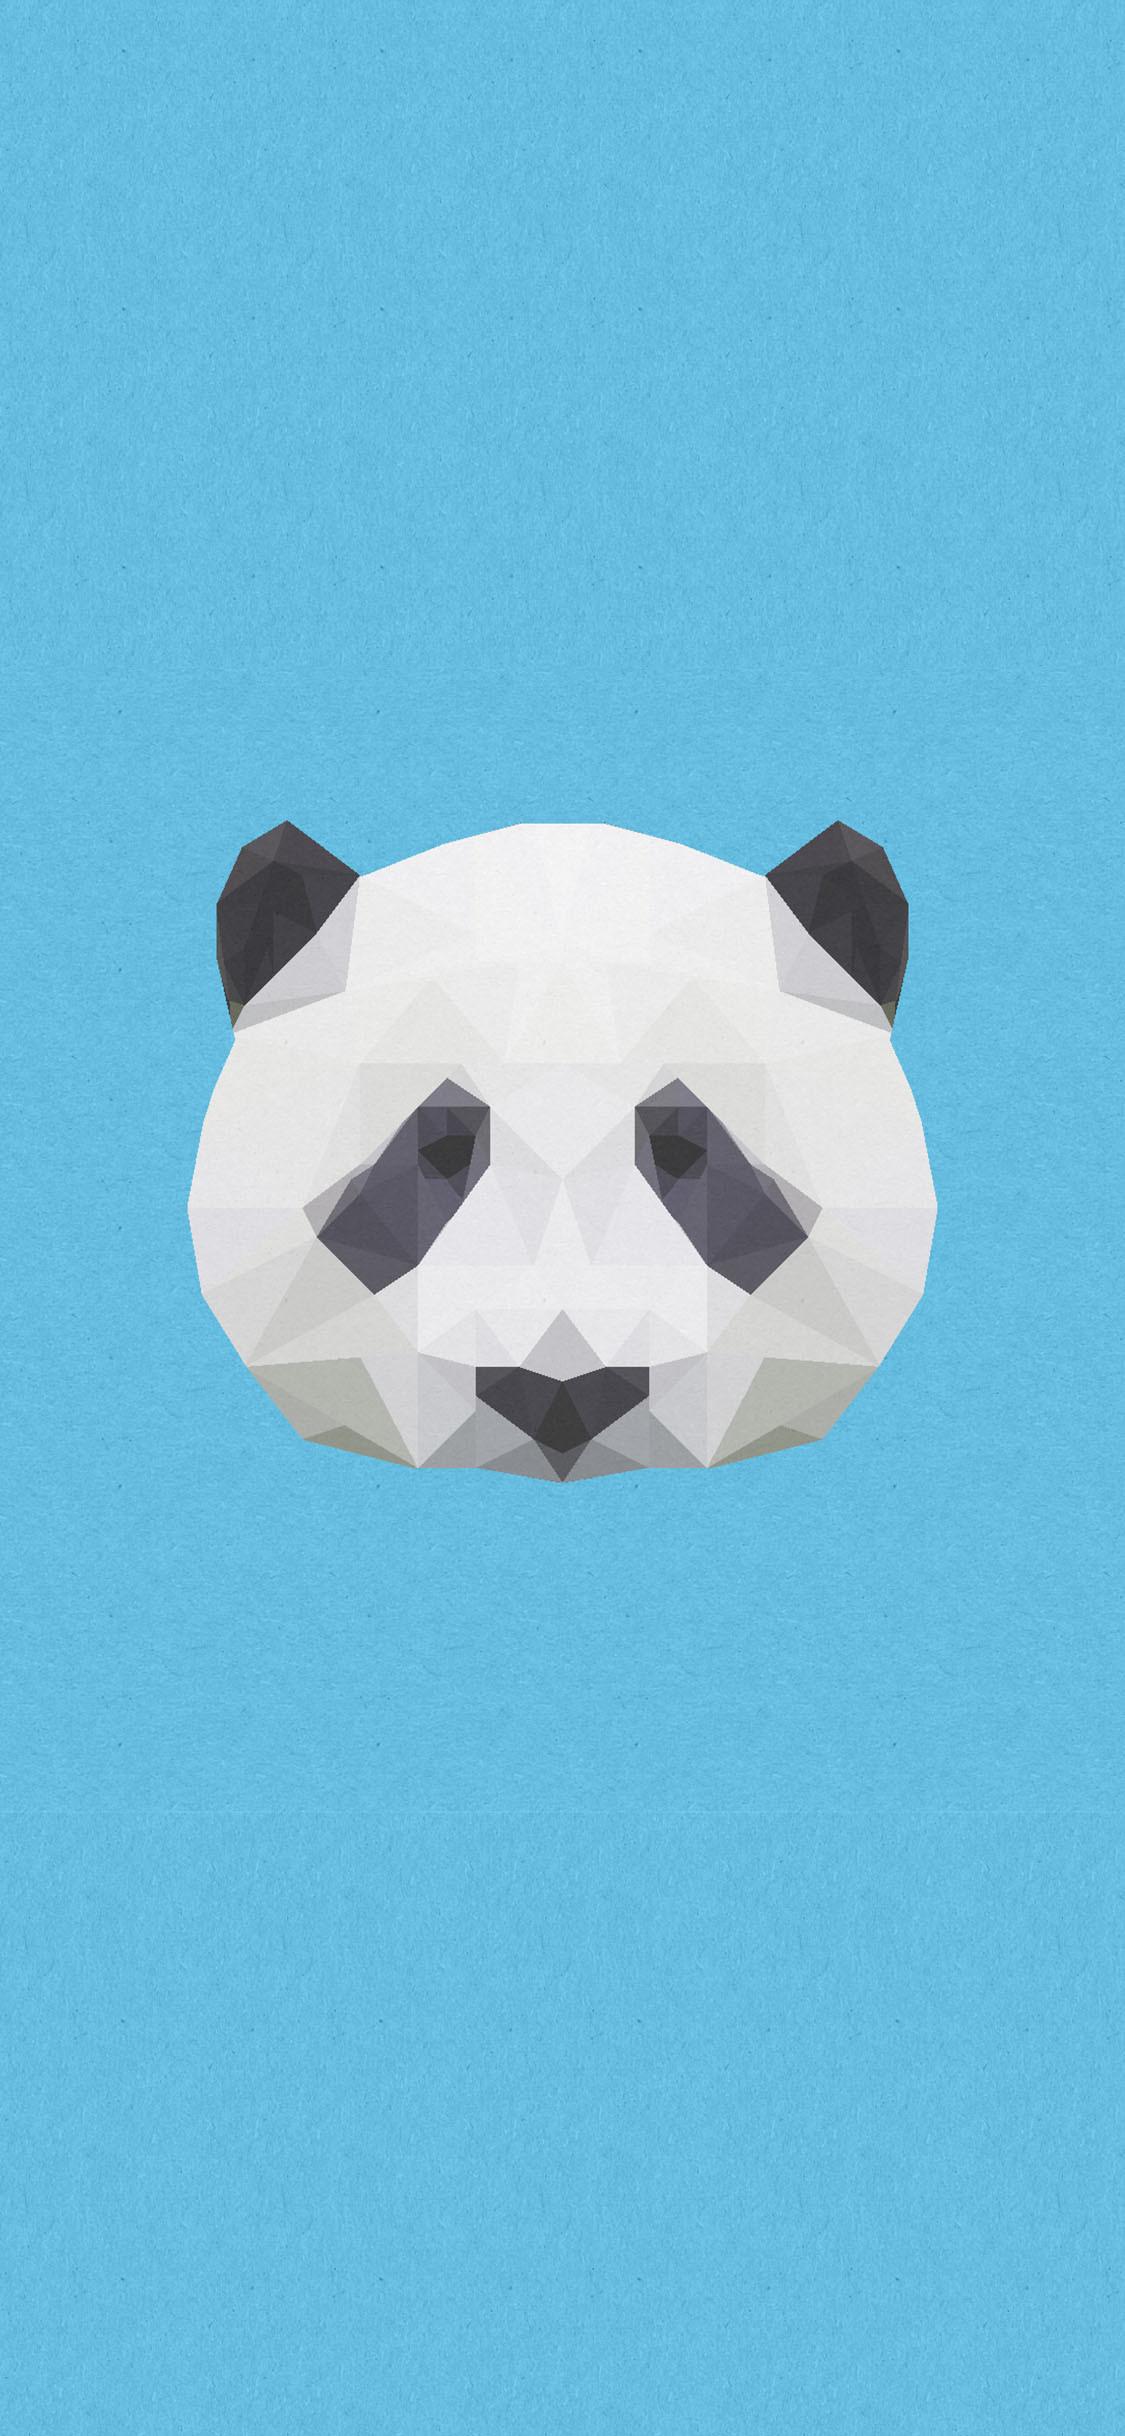 Res: 1125x2436, Lowpoly Panda iPhone X Wallpaper